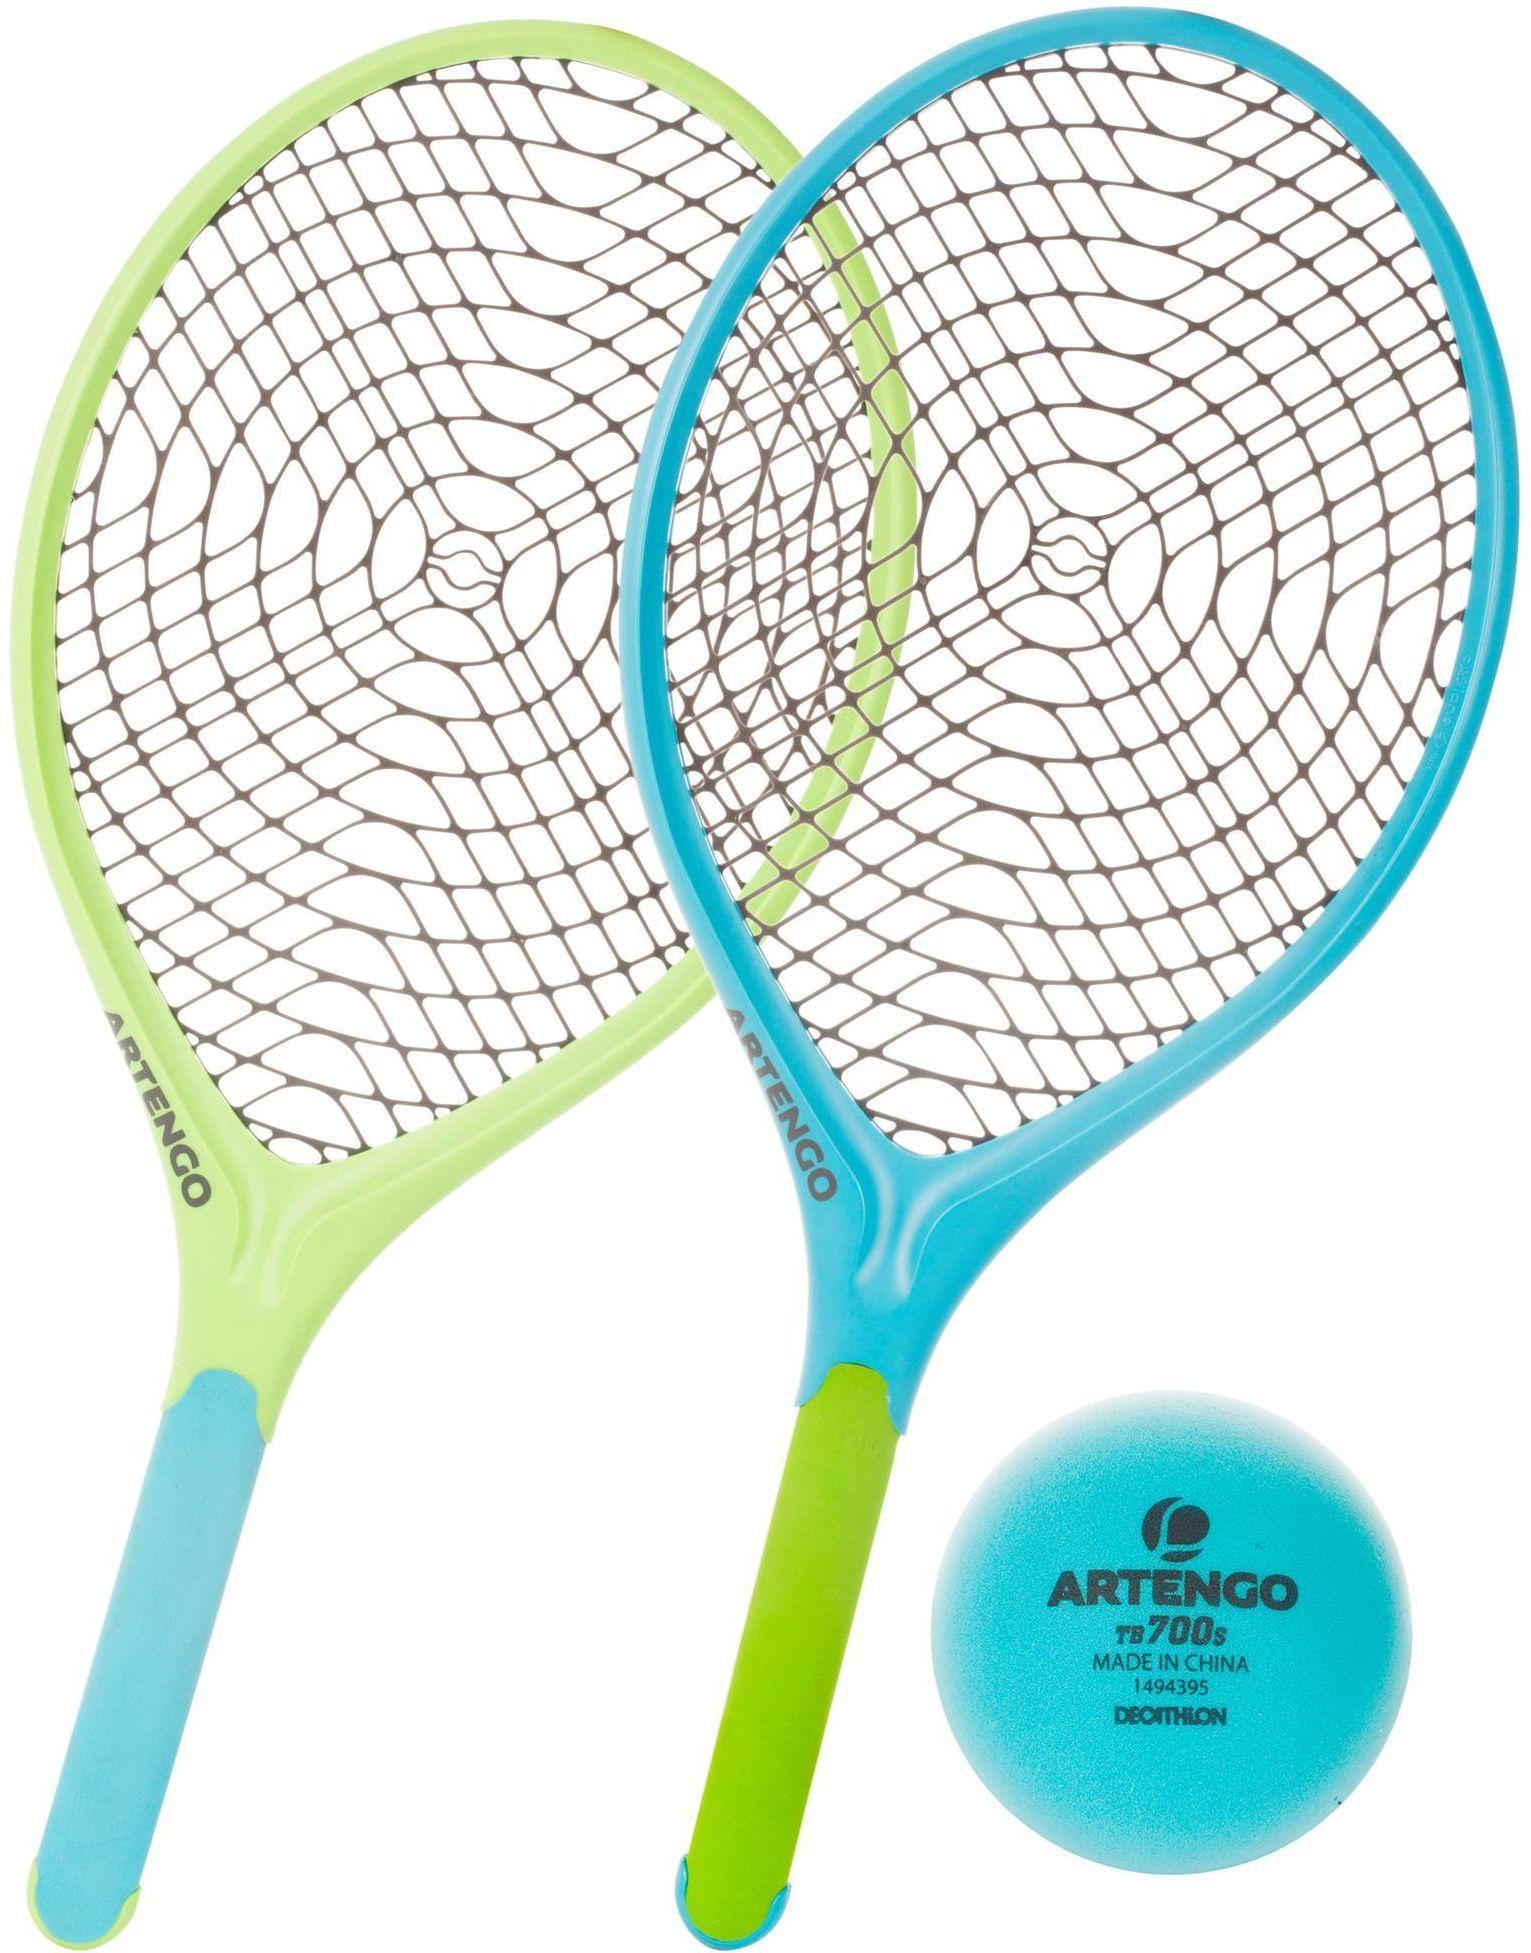 ZESTAW tenis FUNNYTEN: 2 RAKIETY I 1 PIŁKA